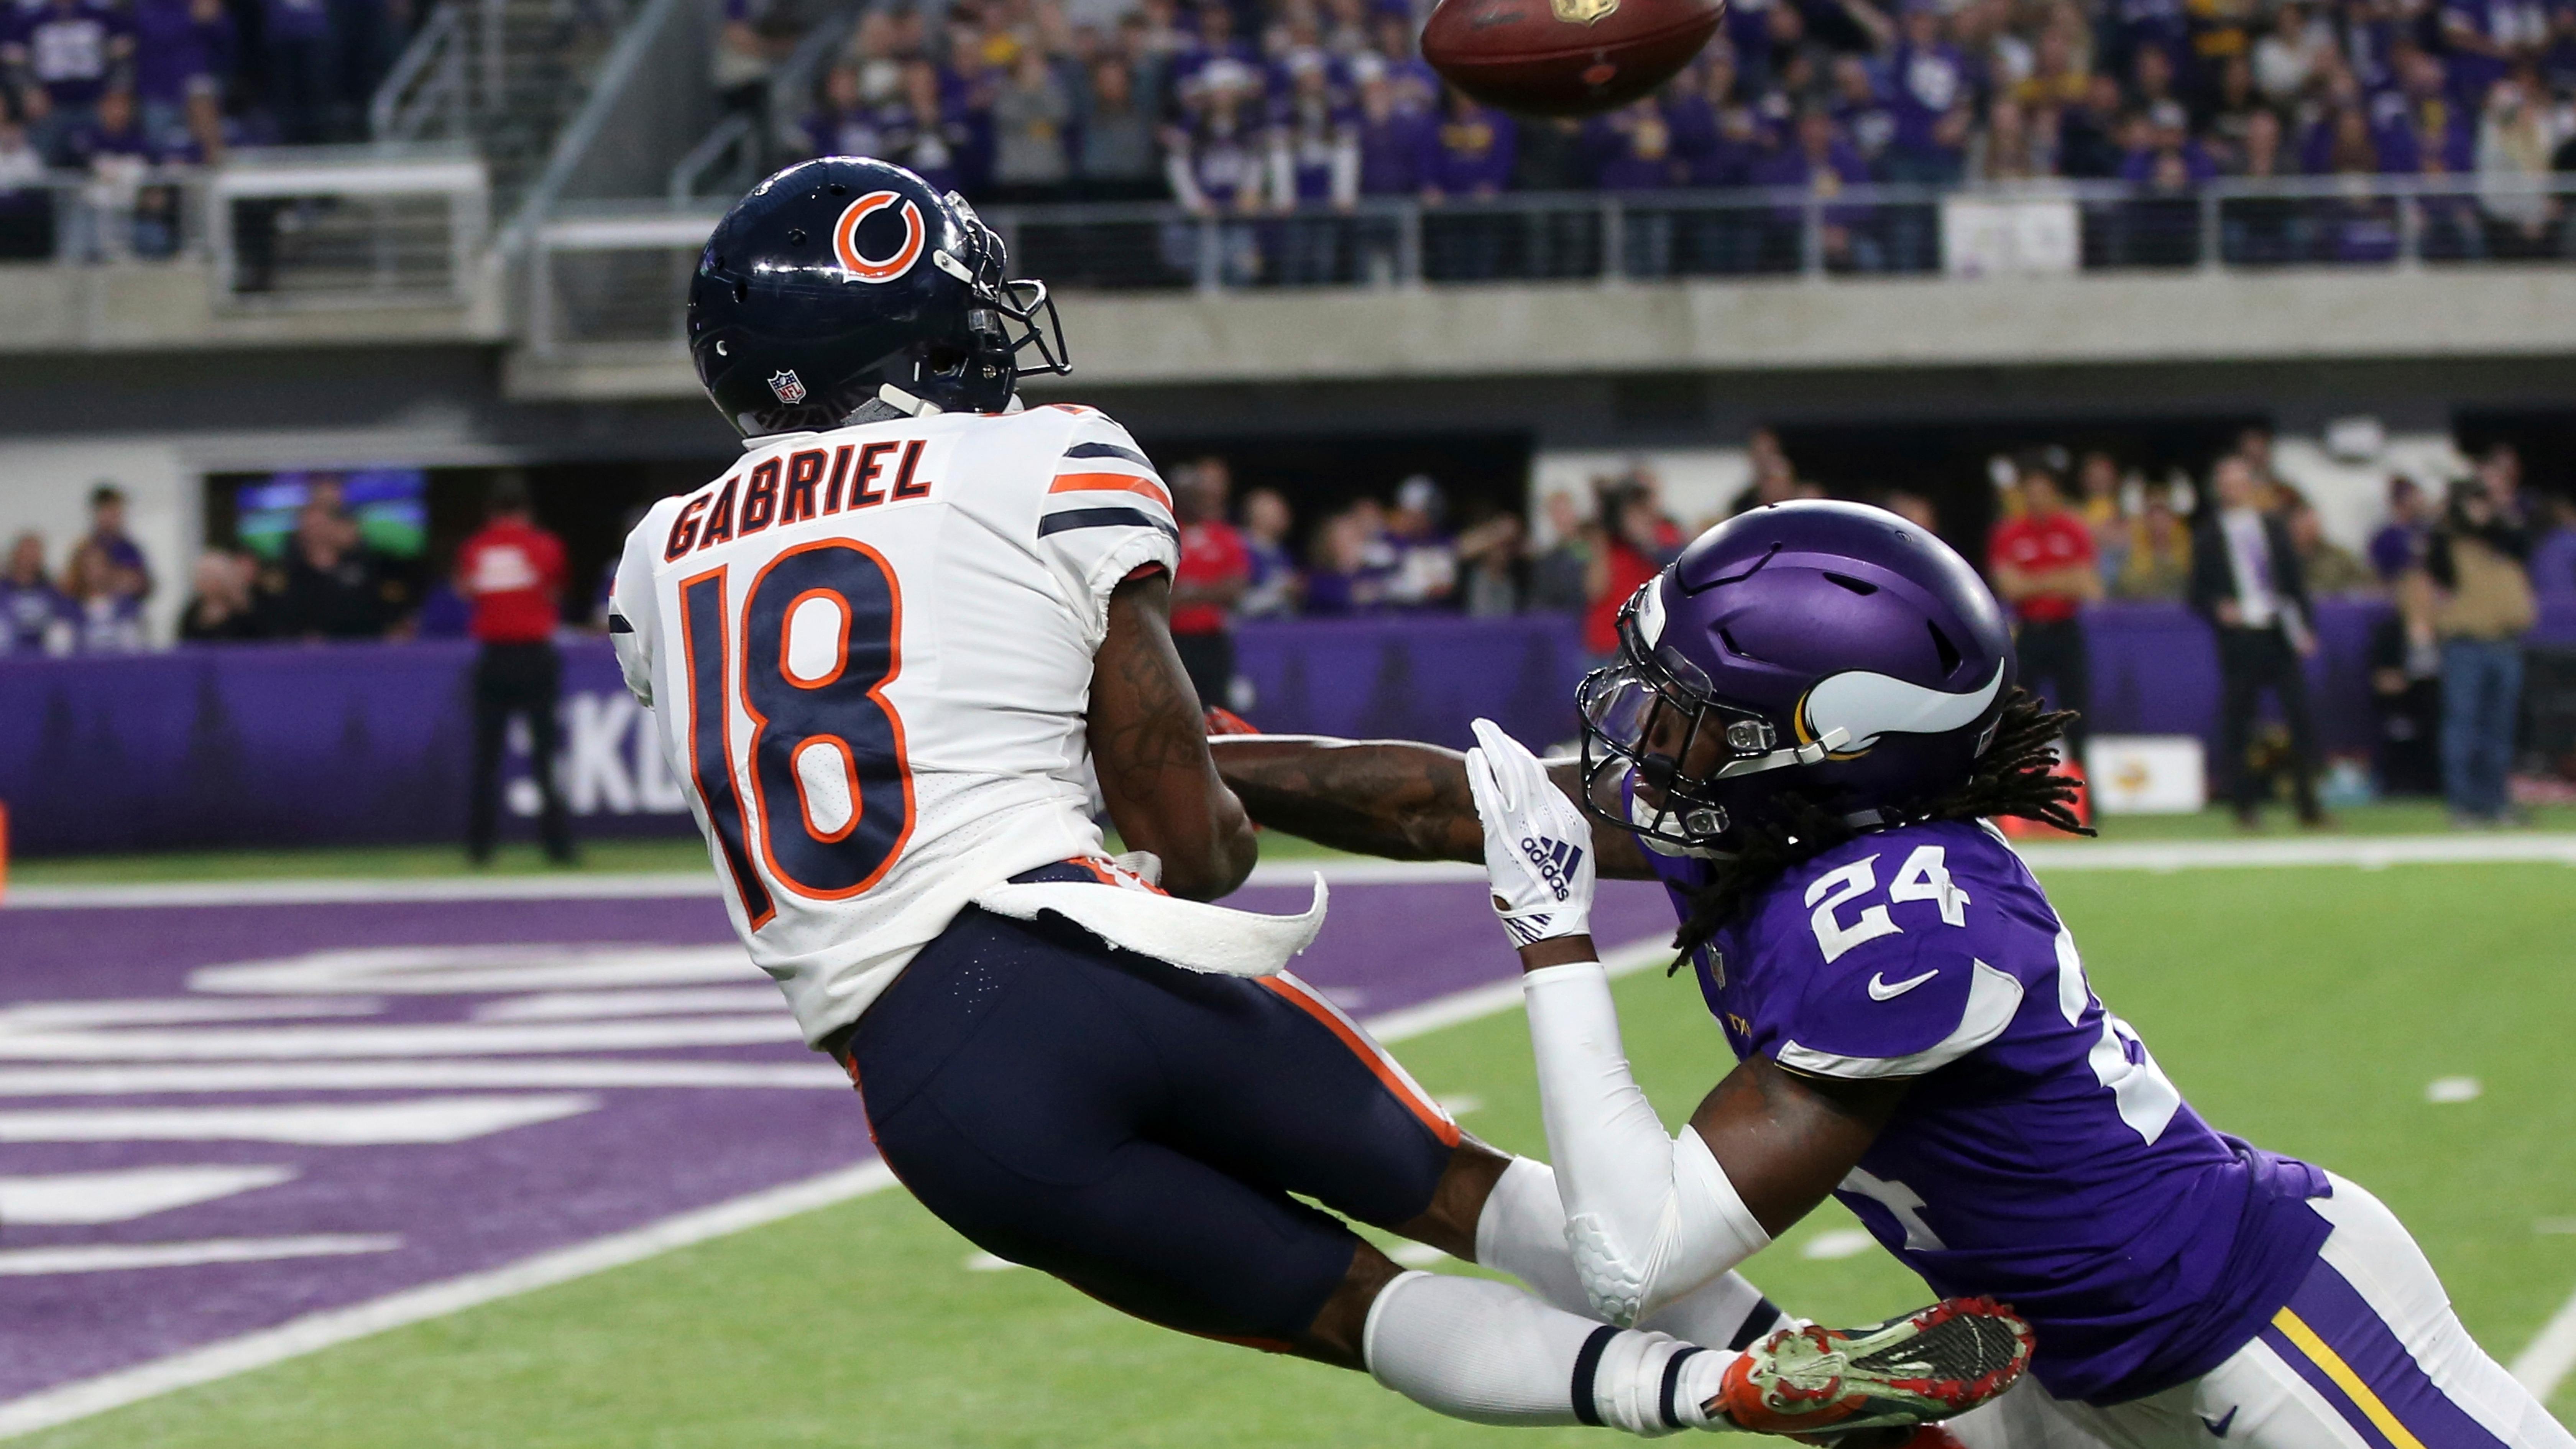 534faa8e NFL Week 17 betting recap: Bears eliminate Vikings, cost one bettor ...